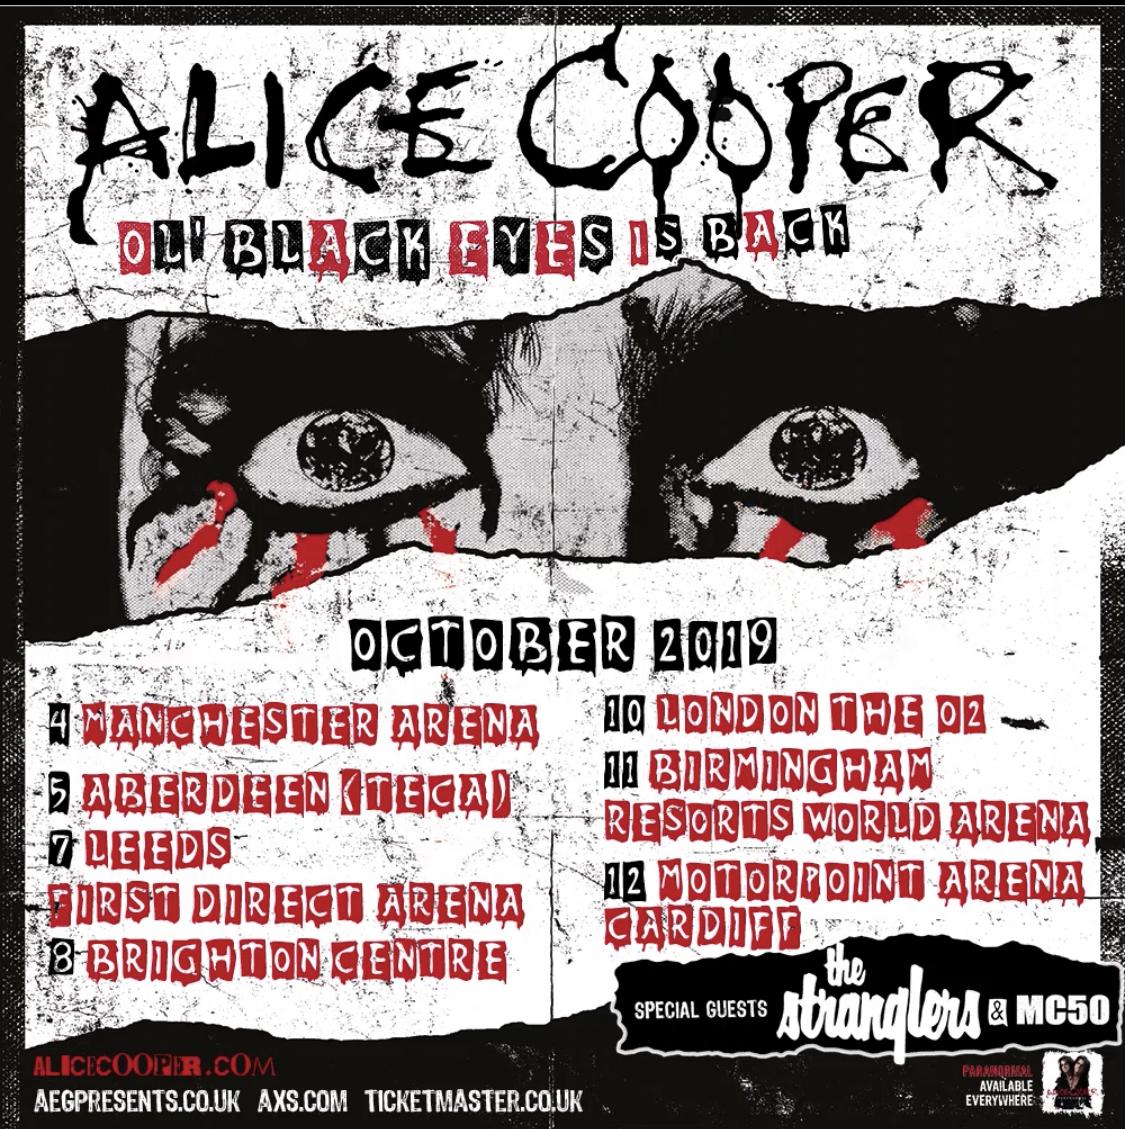 Alice Cooper reparte niños muertos - Página 11 03F26308-D73E-4F6E-A15C-229FEFF026A1